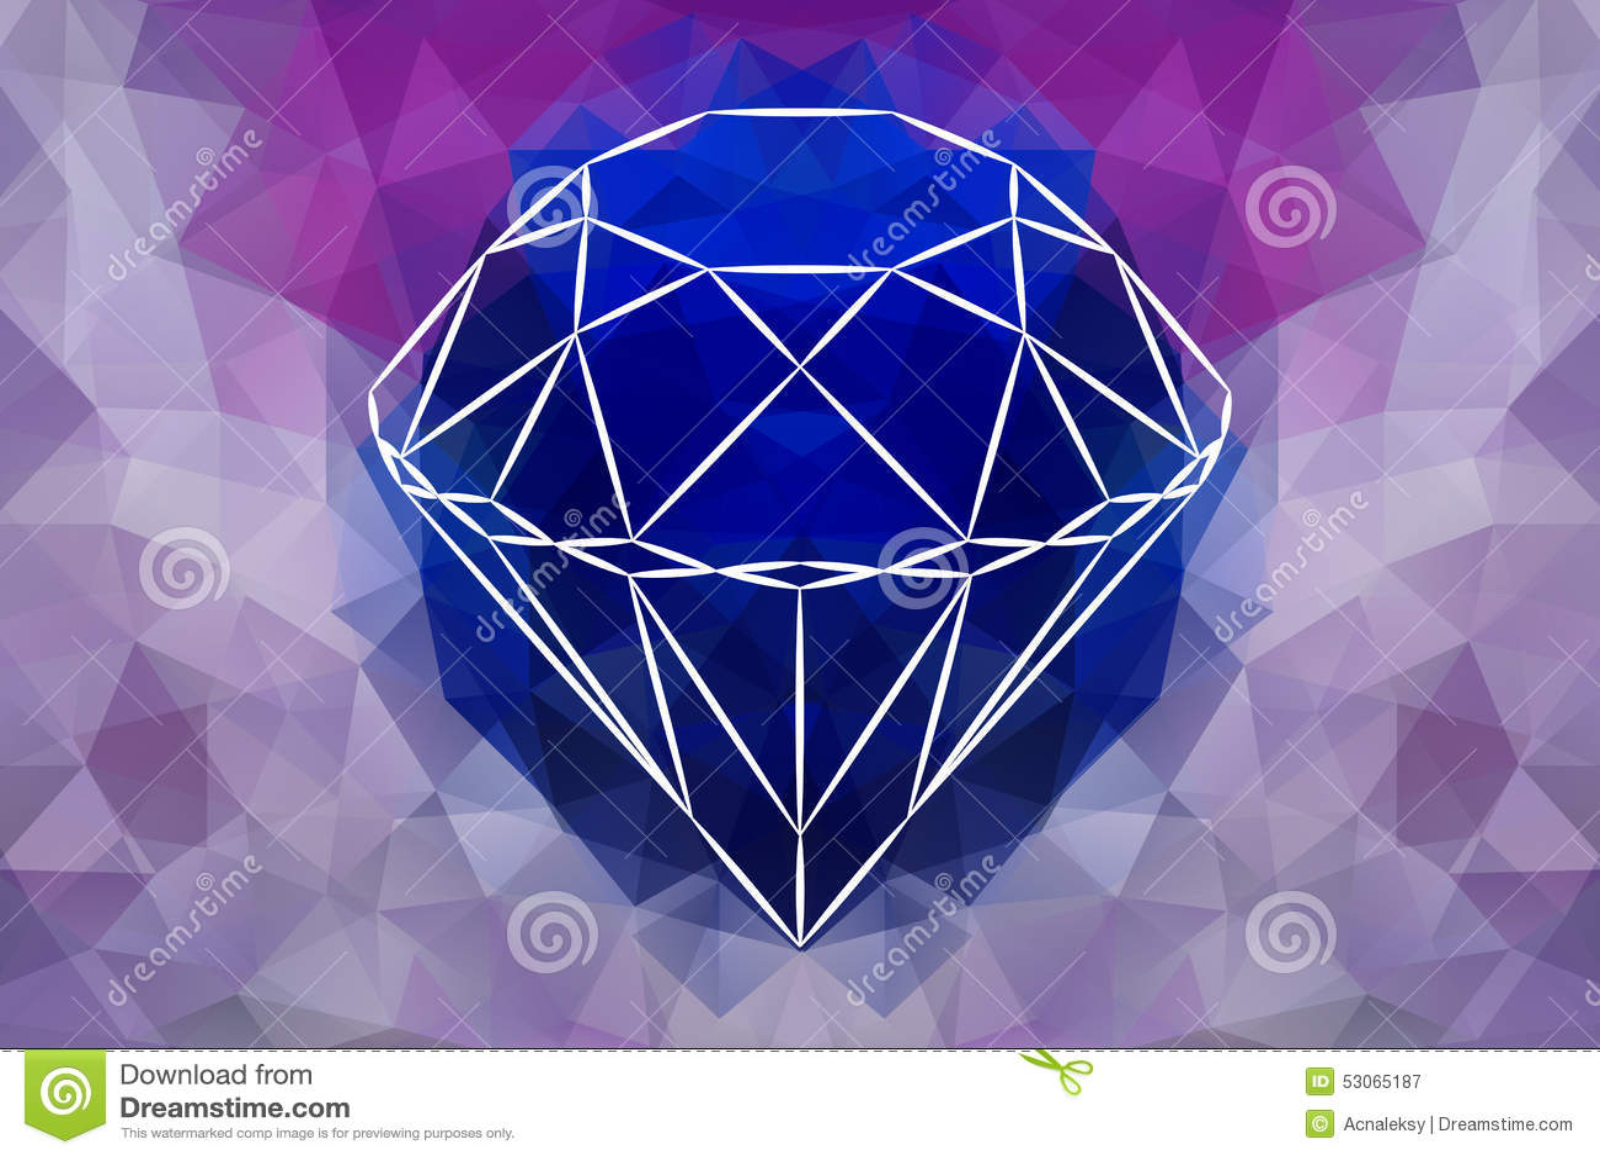 Vector Abstract Jewelry diamond, geometric shape of gemstone